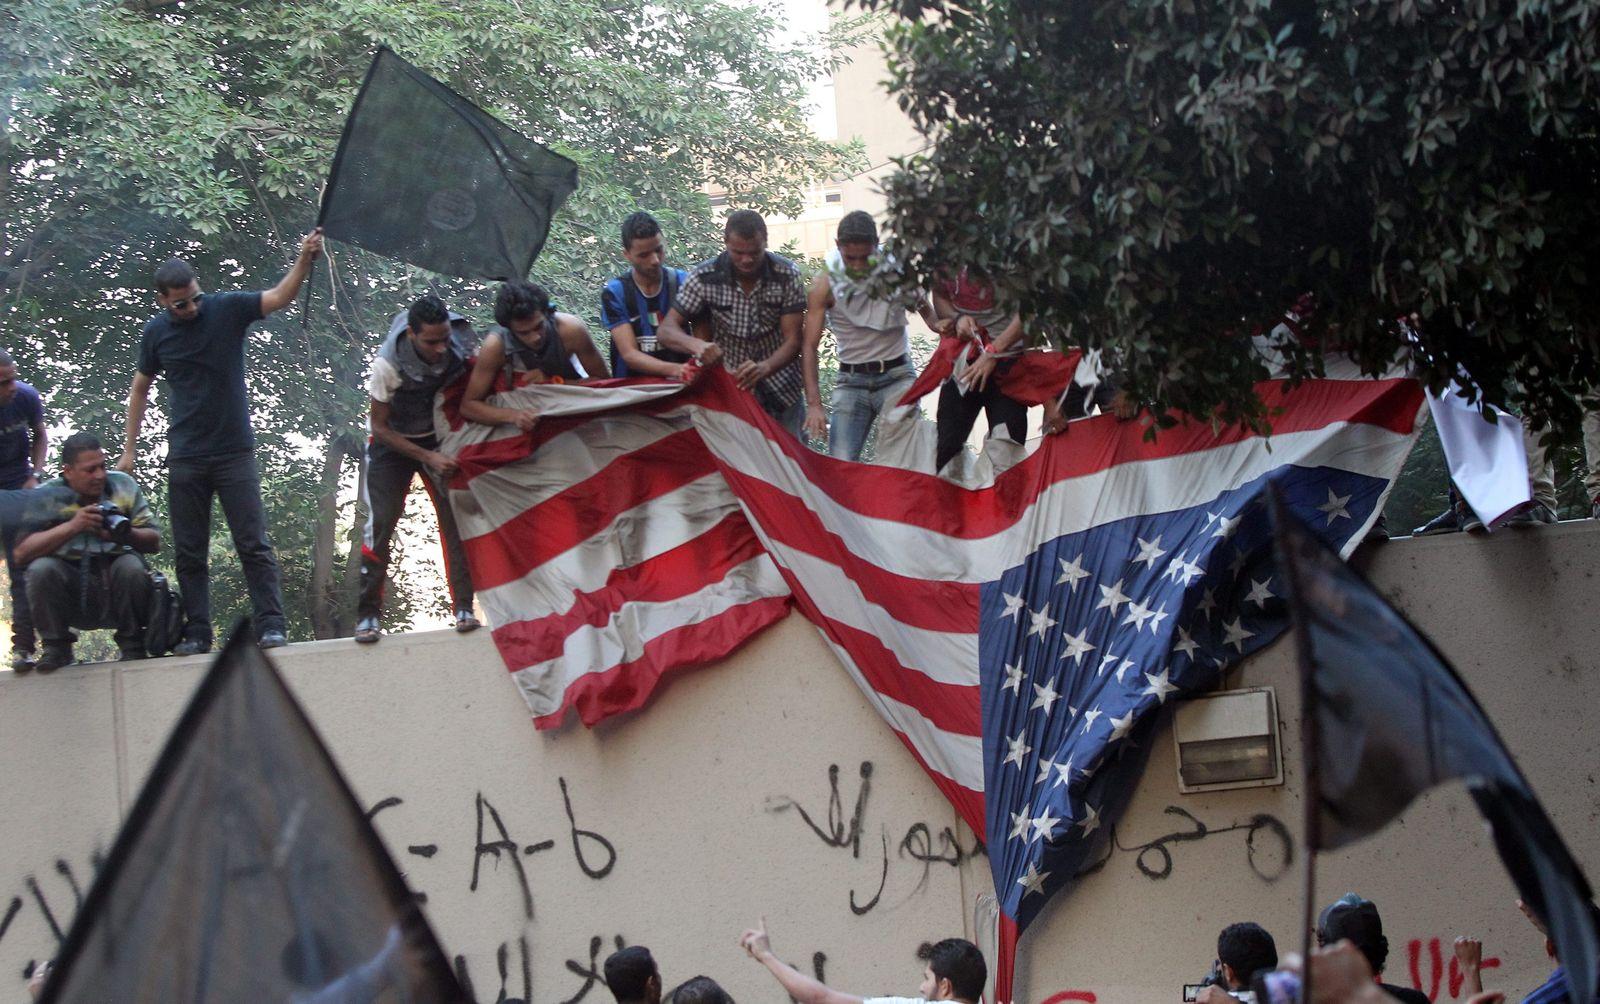 Protest in Kairo / US-Botschaft